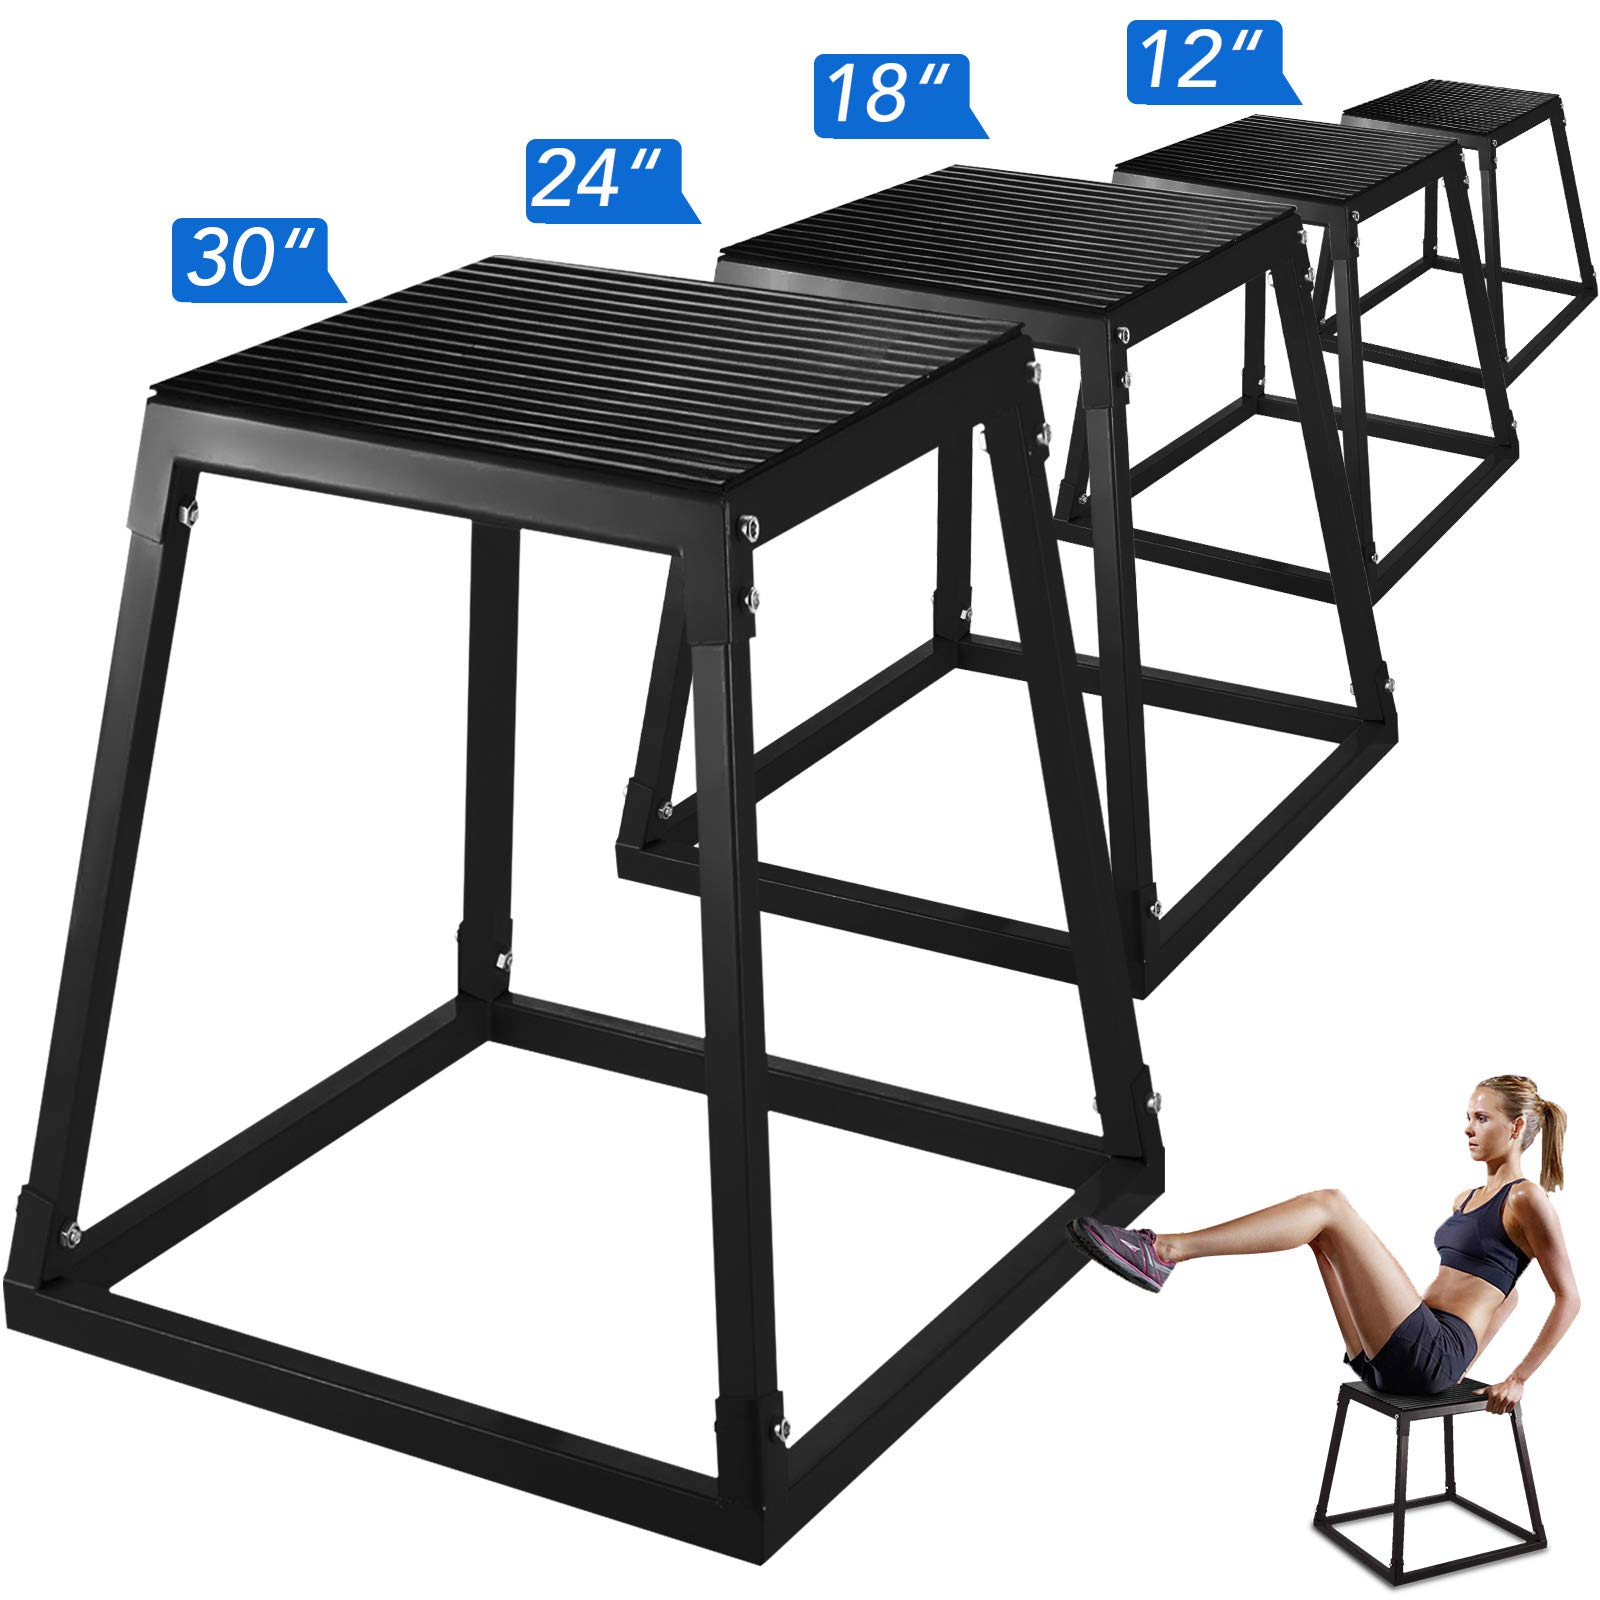 popsport Plyometric Platform Box 12/18/24/30 Inch Fitness Exercise Jump Box Step Plyometric Box Jump for Exercise Fit Training (Black, 12/18/24/30inch)